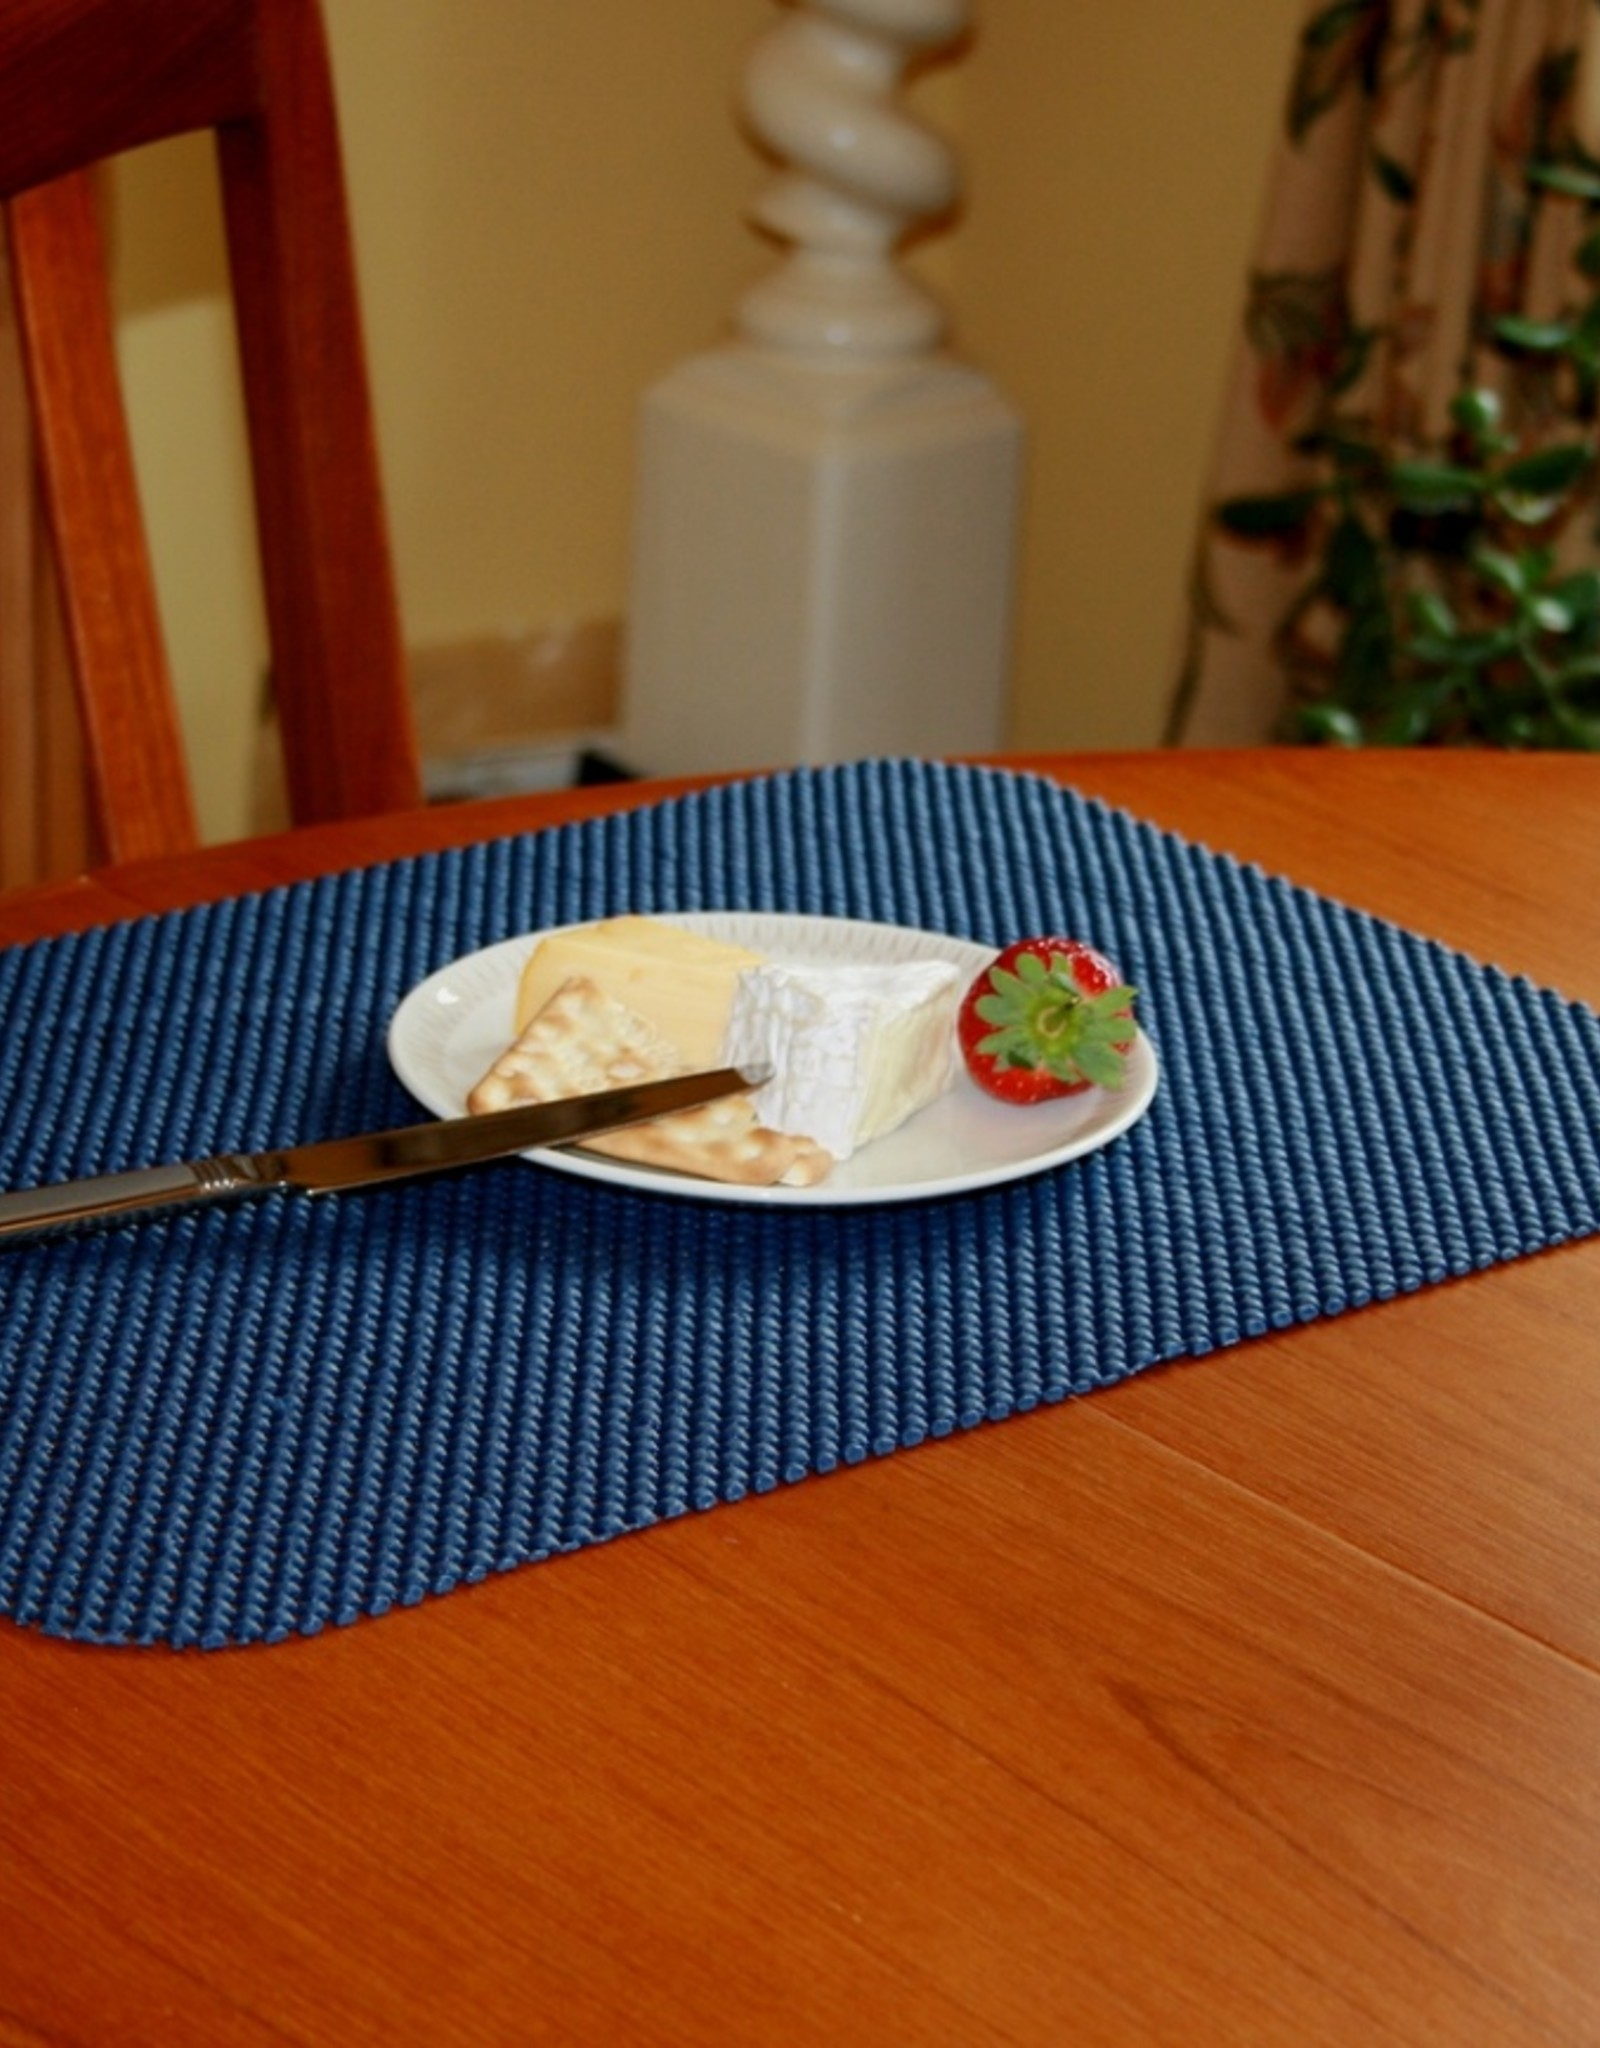 Stayput Anti-slip placemat en onderzetter set